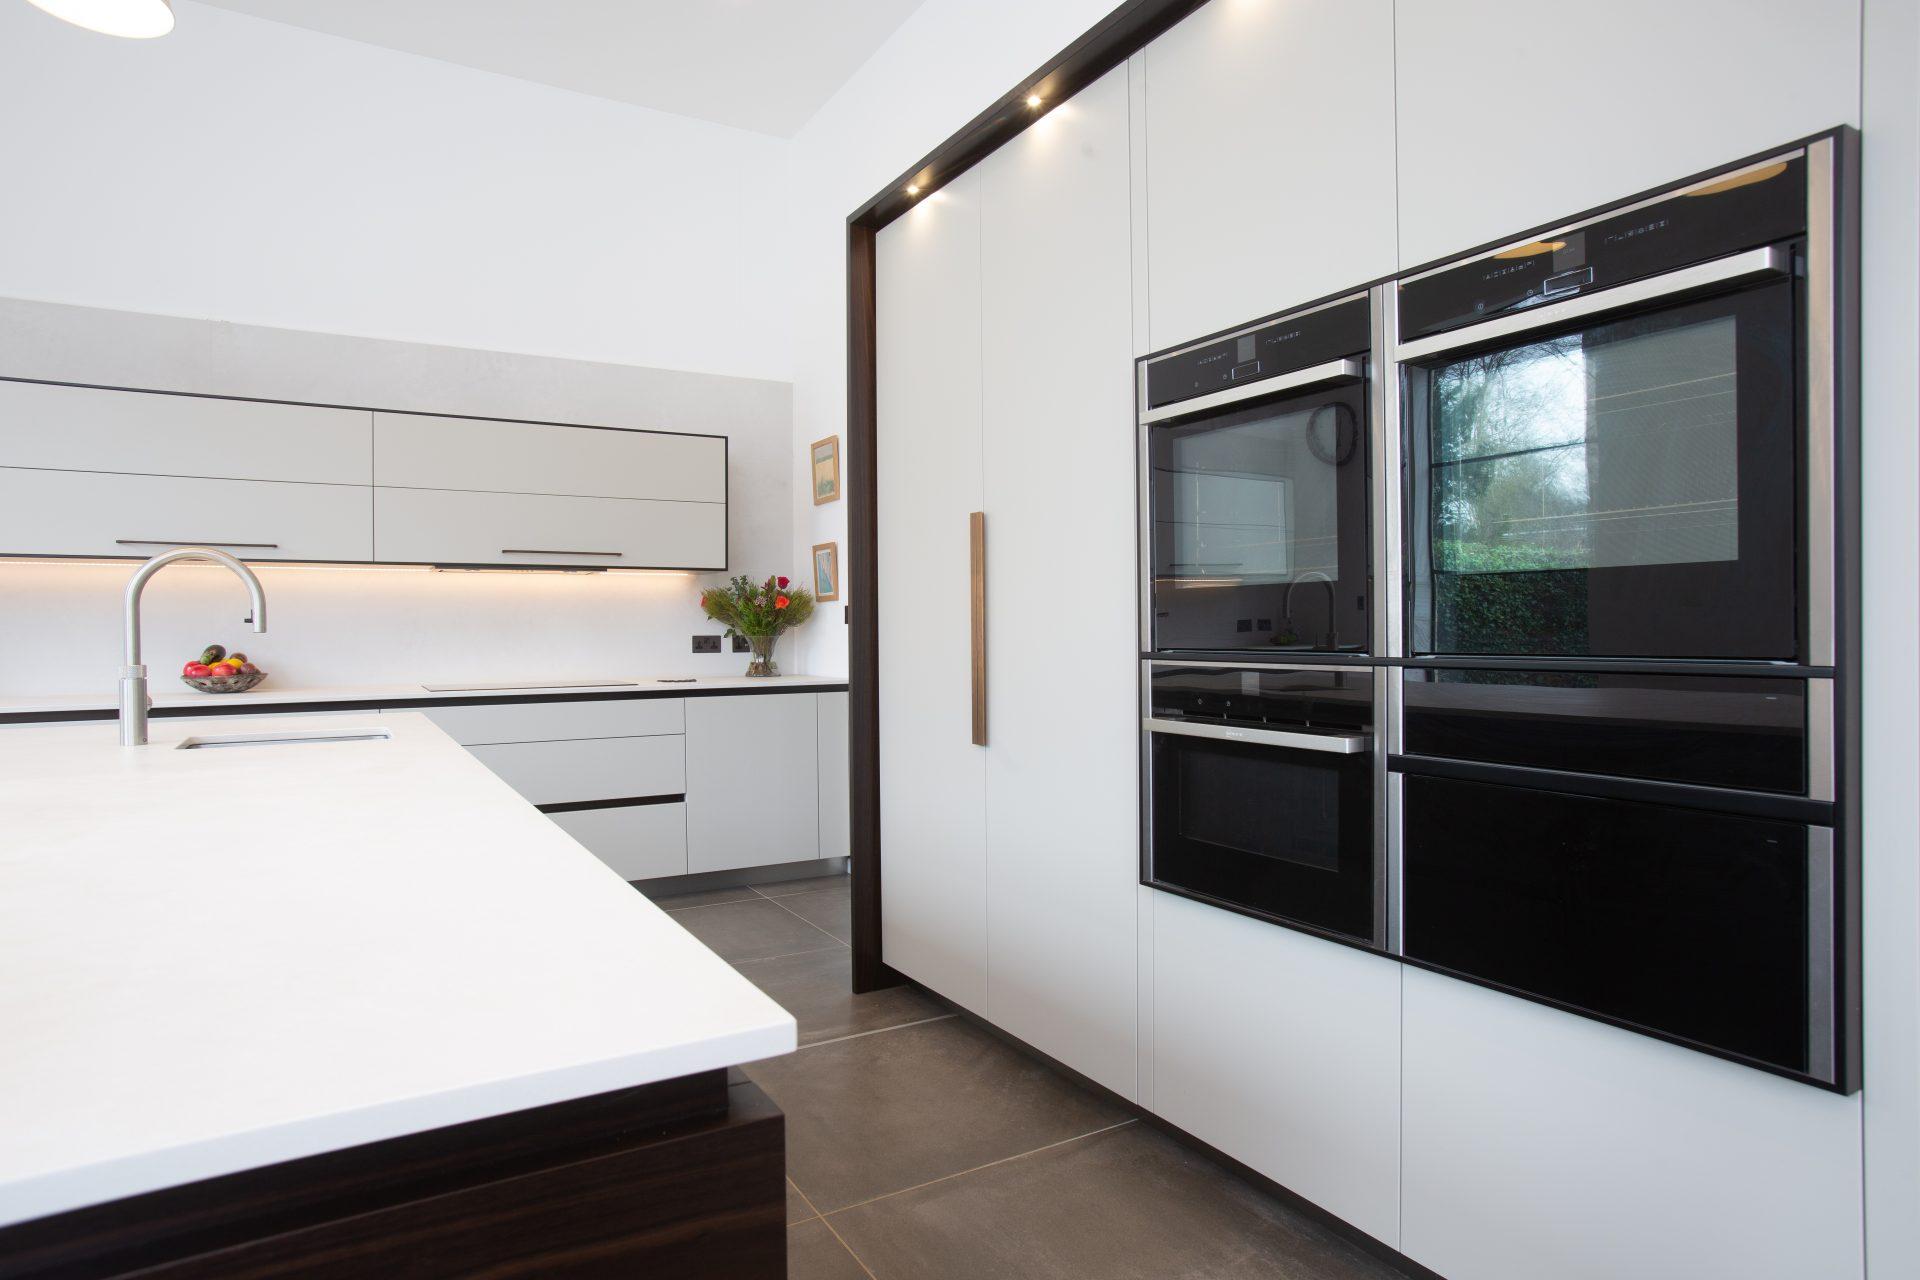 Cavendish Arts Kitchen